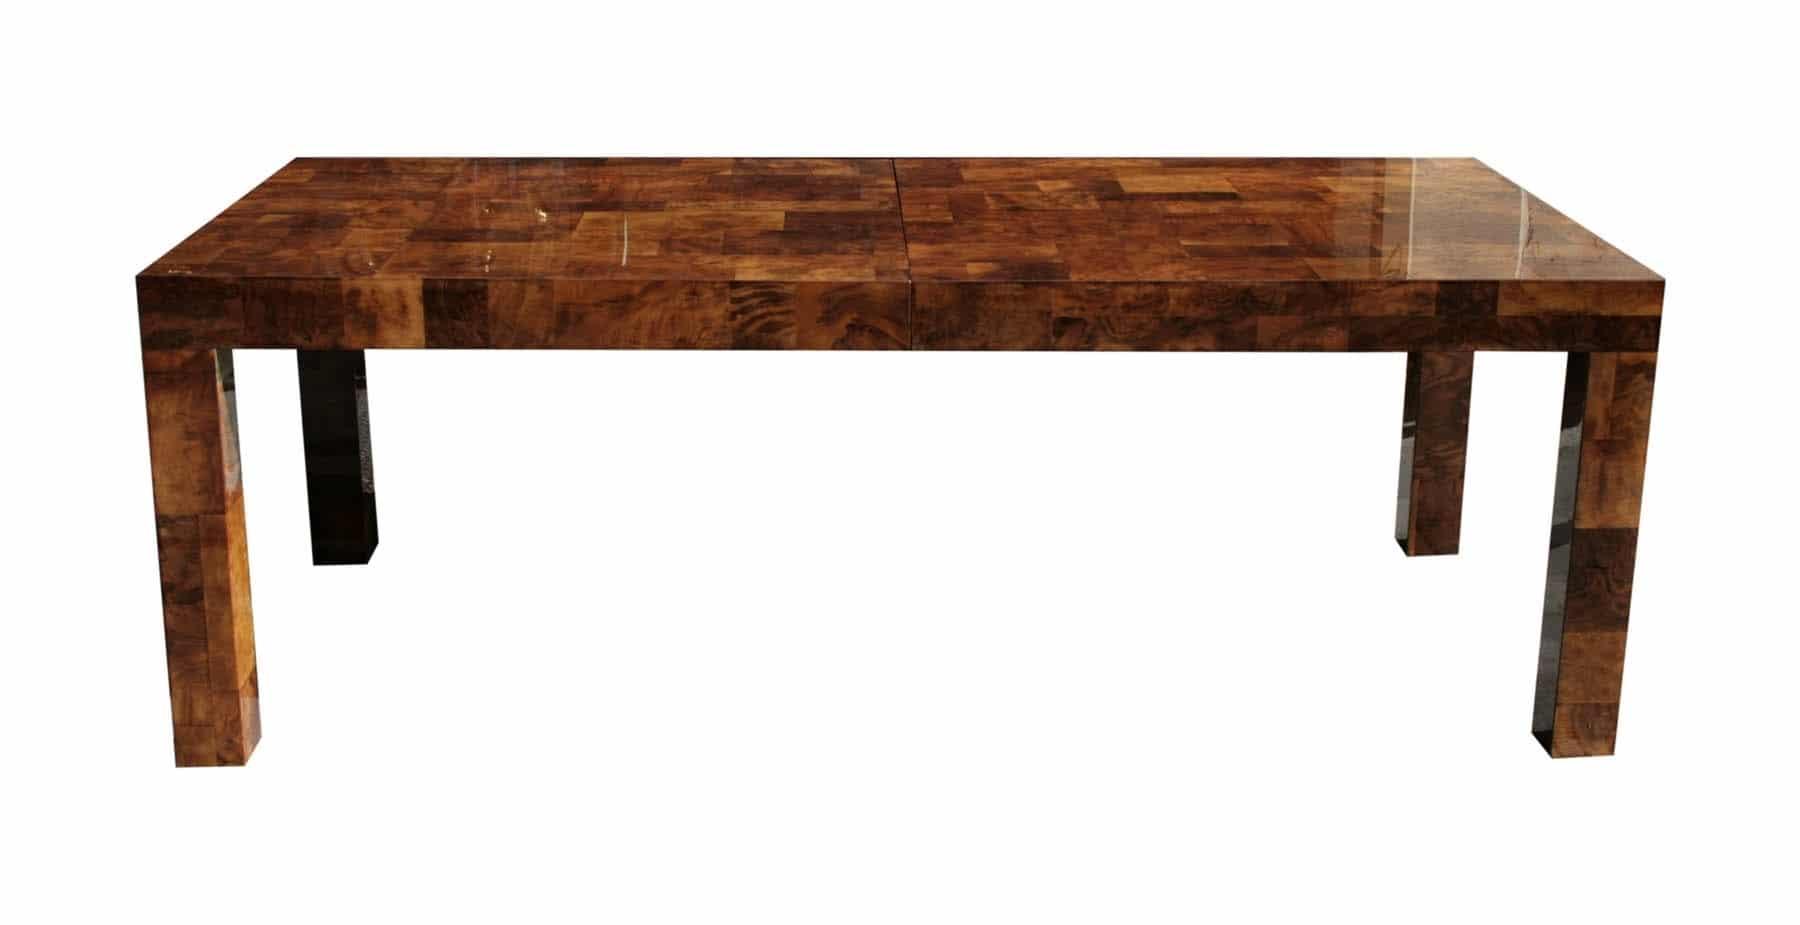 Walnut Dining Bench Paul Evans Dining Table in Walnut Burl | Todd Merrill Studio